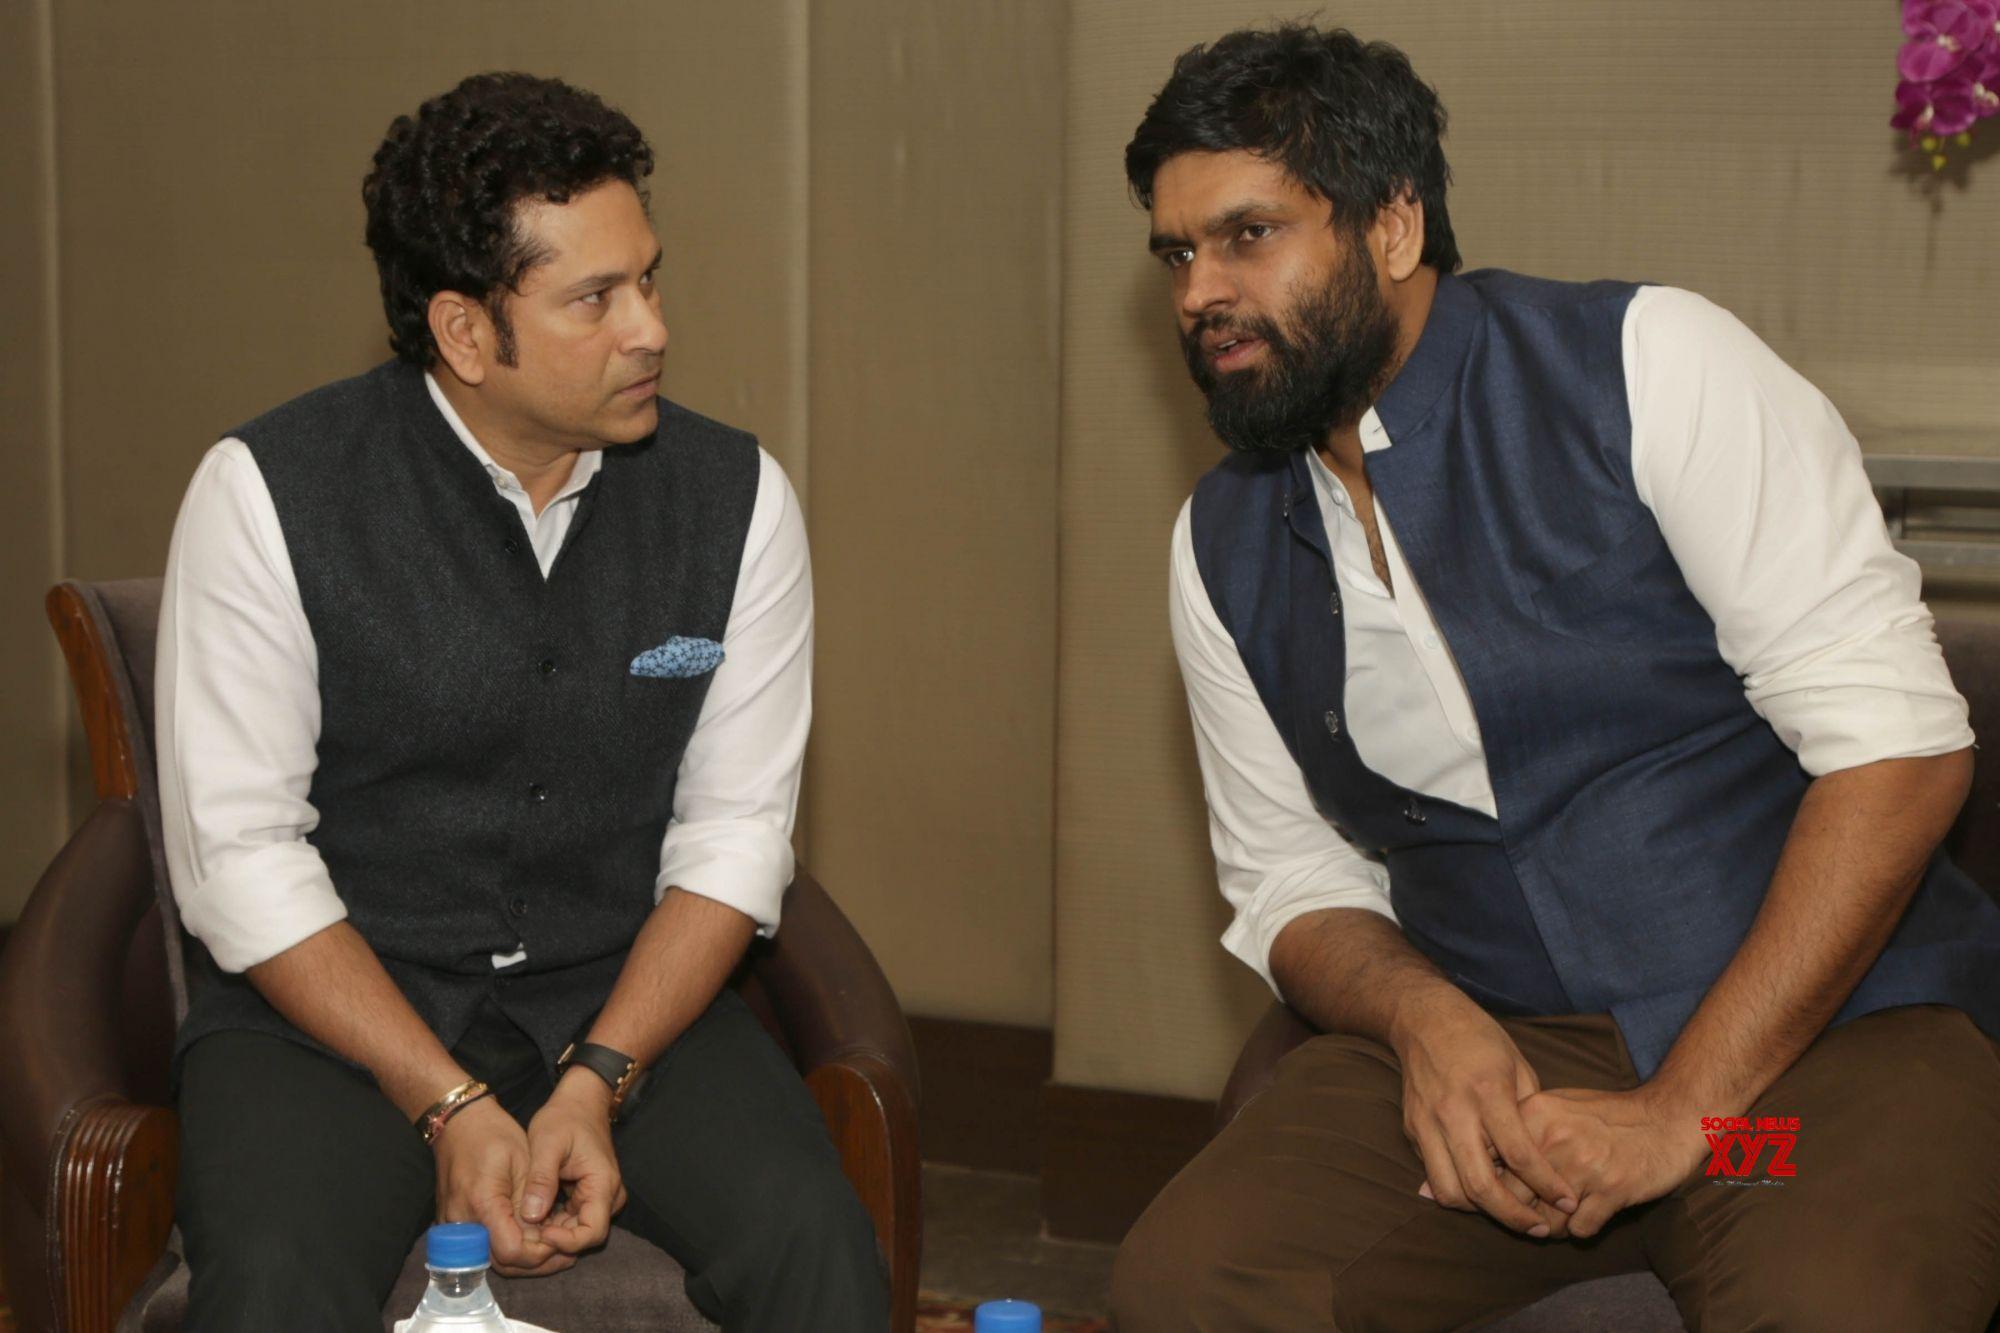 New Delhi: Sachin Tendulkar film promotion